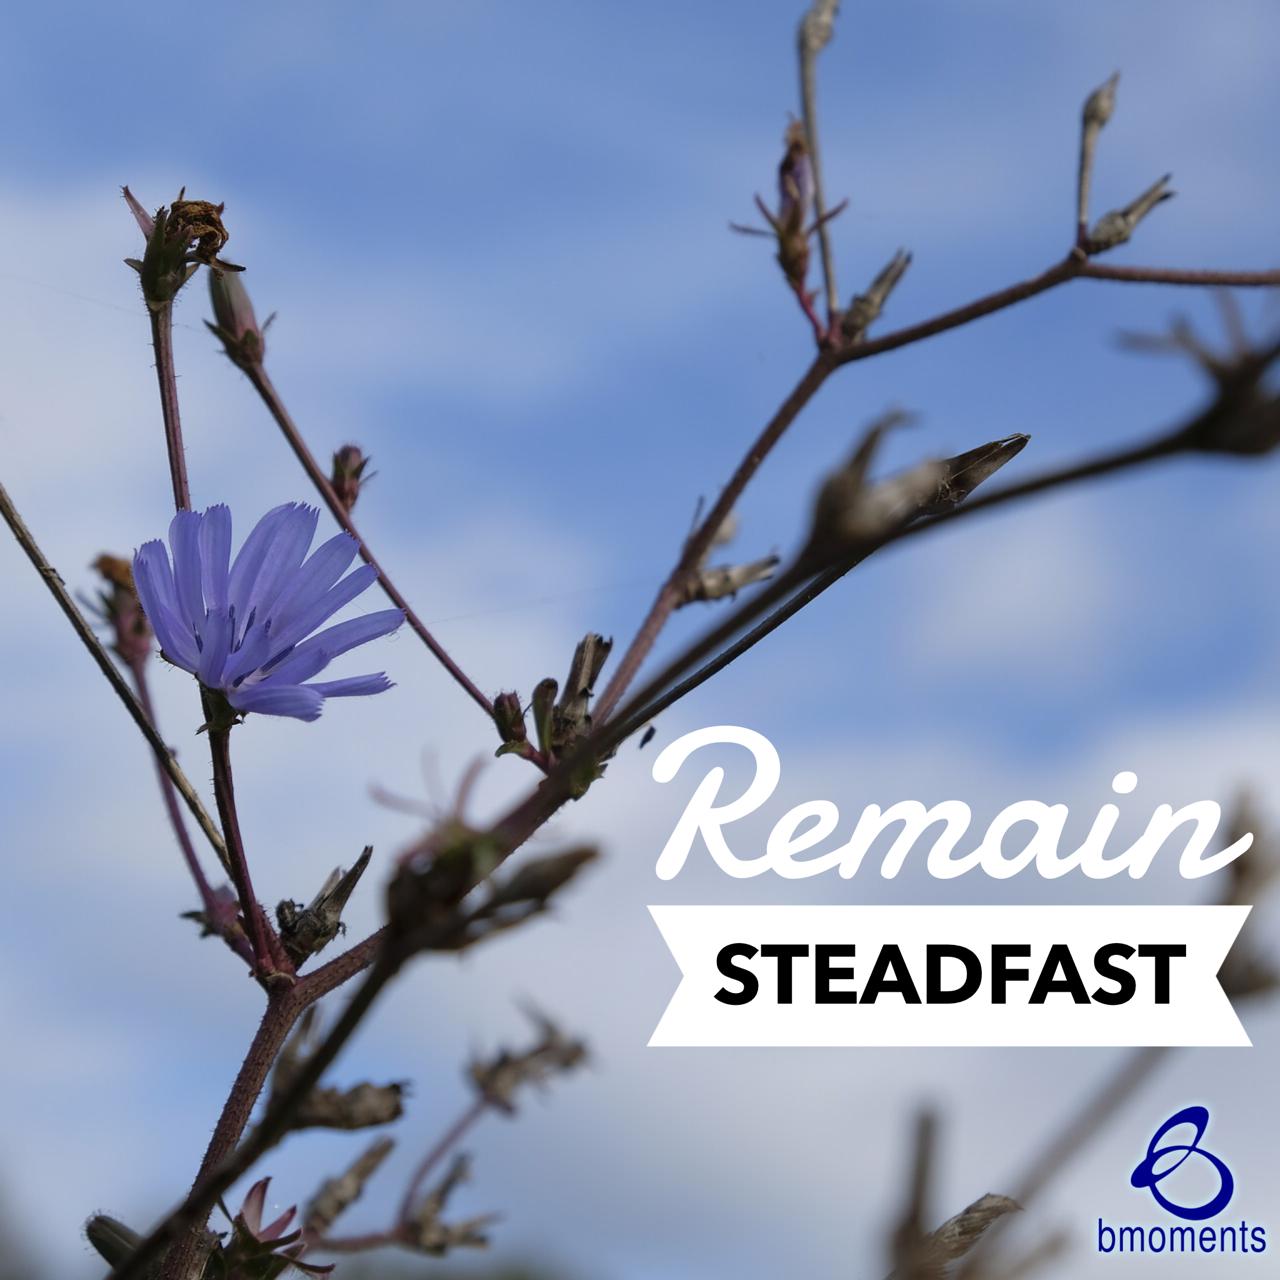 Remain Steadfast Despite Others' Disbelief